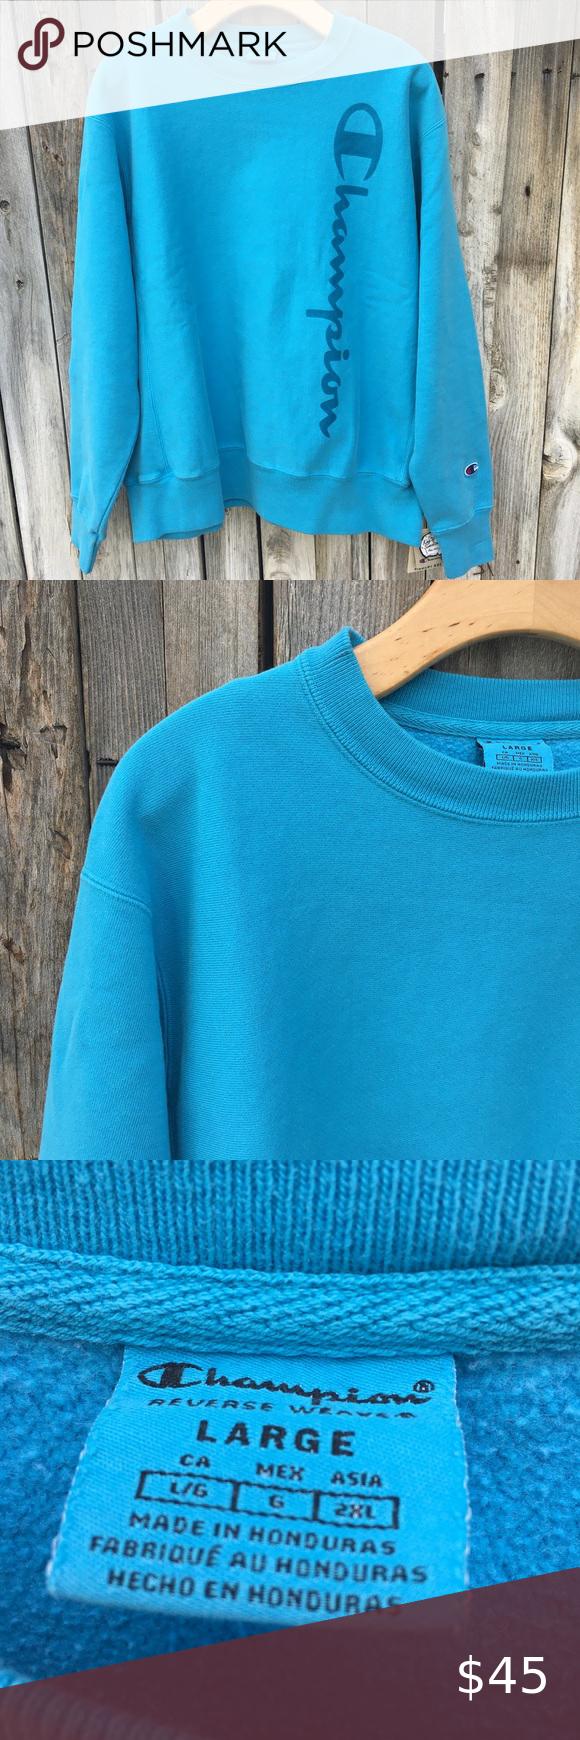 Nwt Champion Reverse Weave Crewneck Sweatshirt L Champion Reverse Weave Crew Neck Sweatshirt Clothes Design [ 1740 x 580 Pixel ]